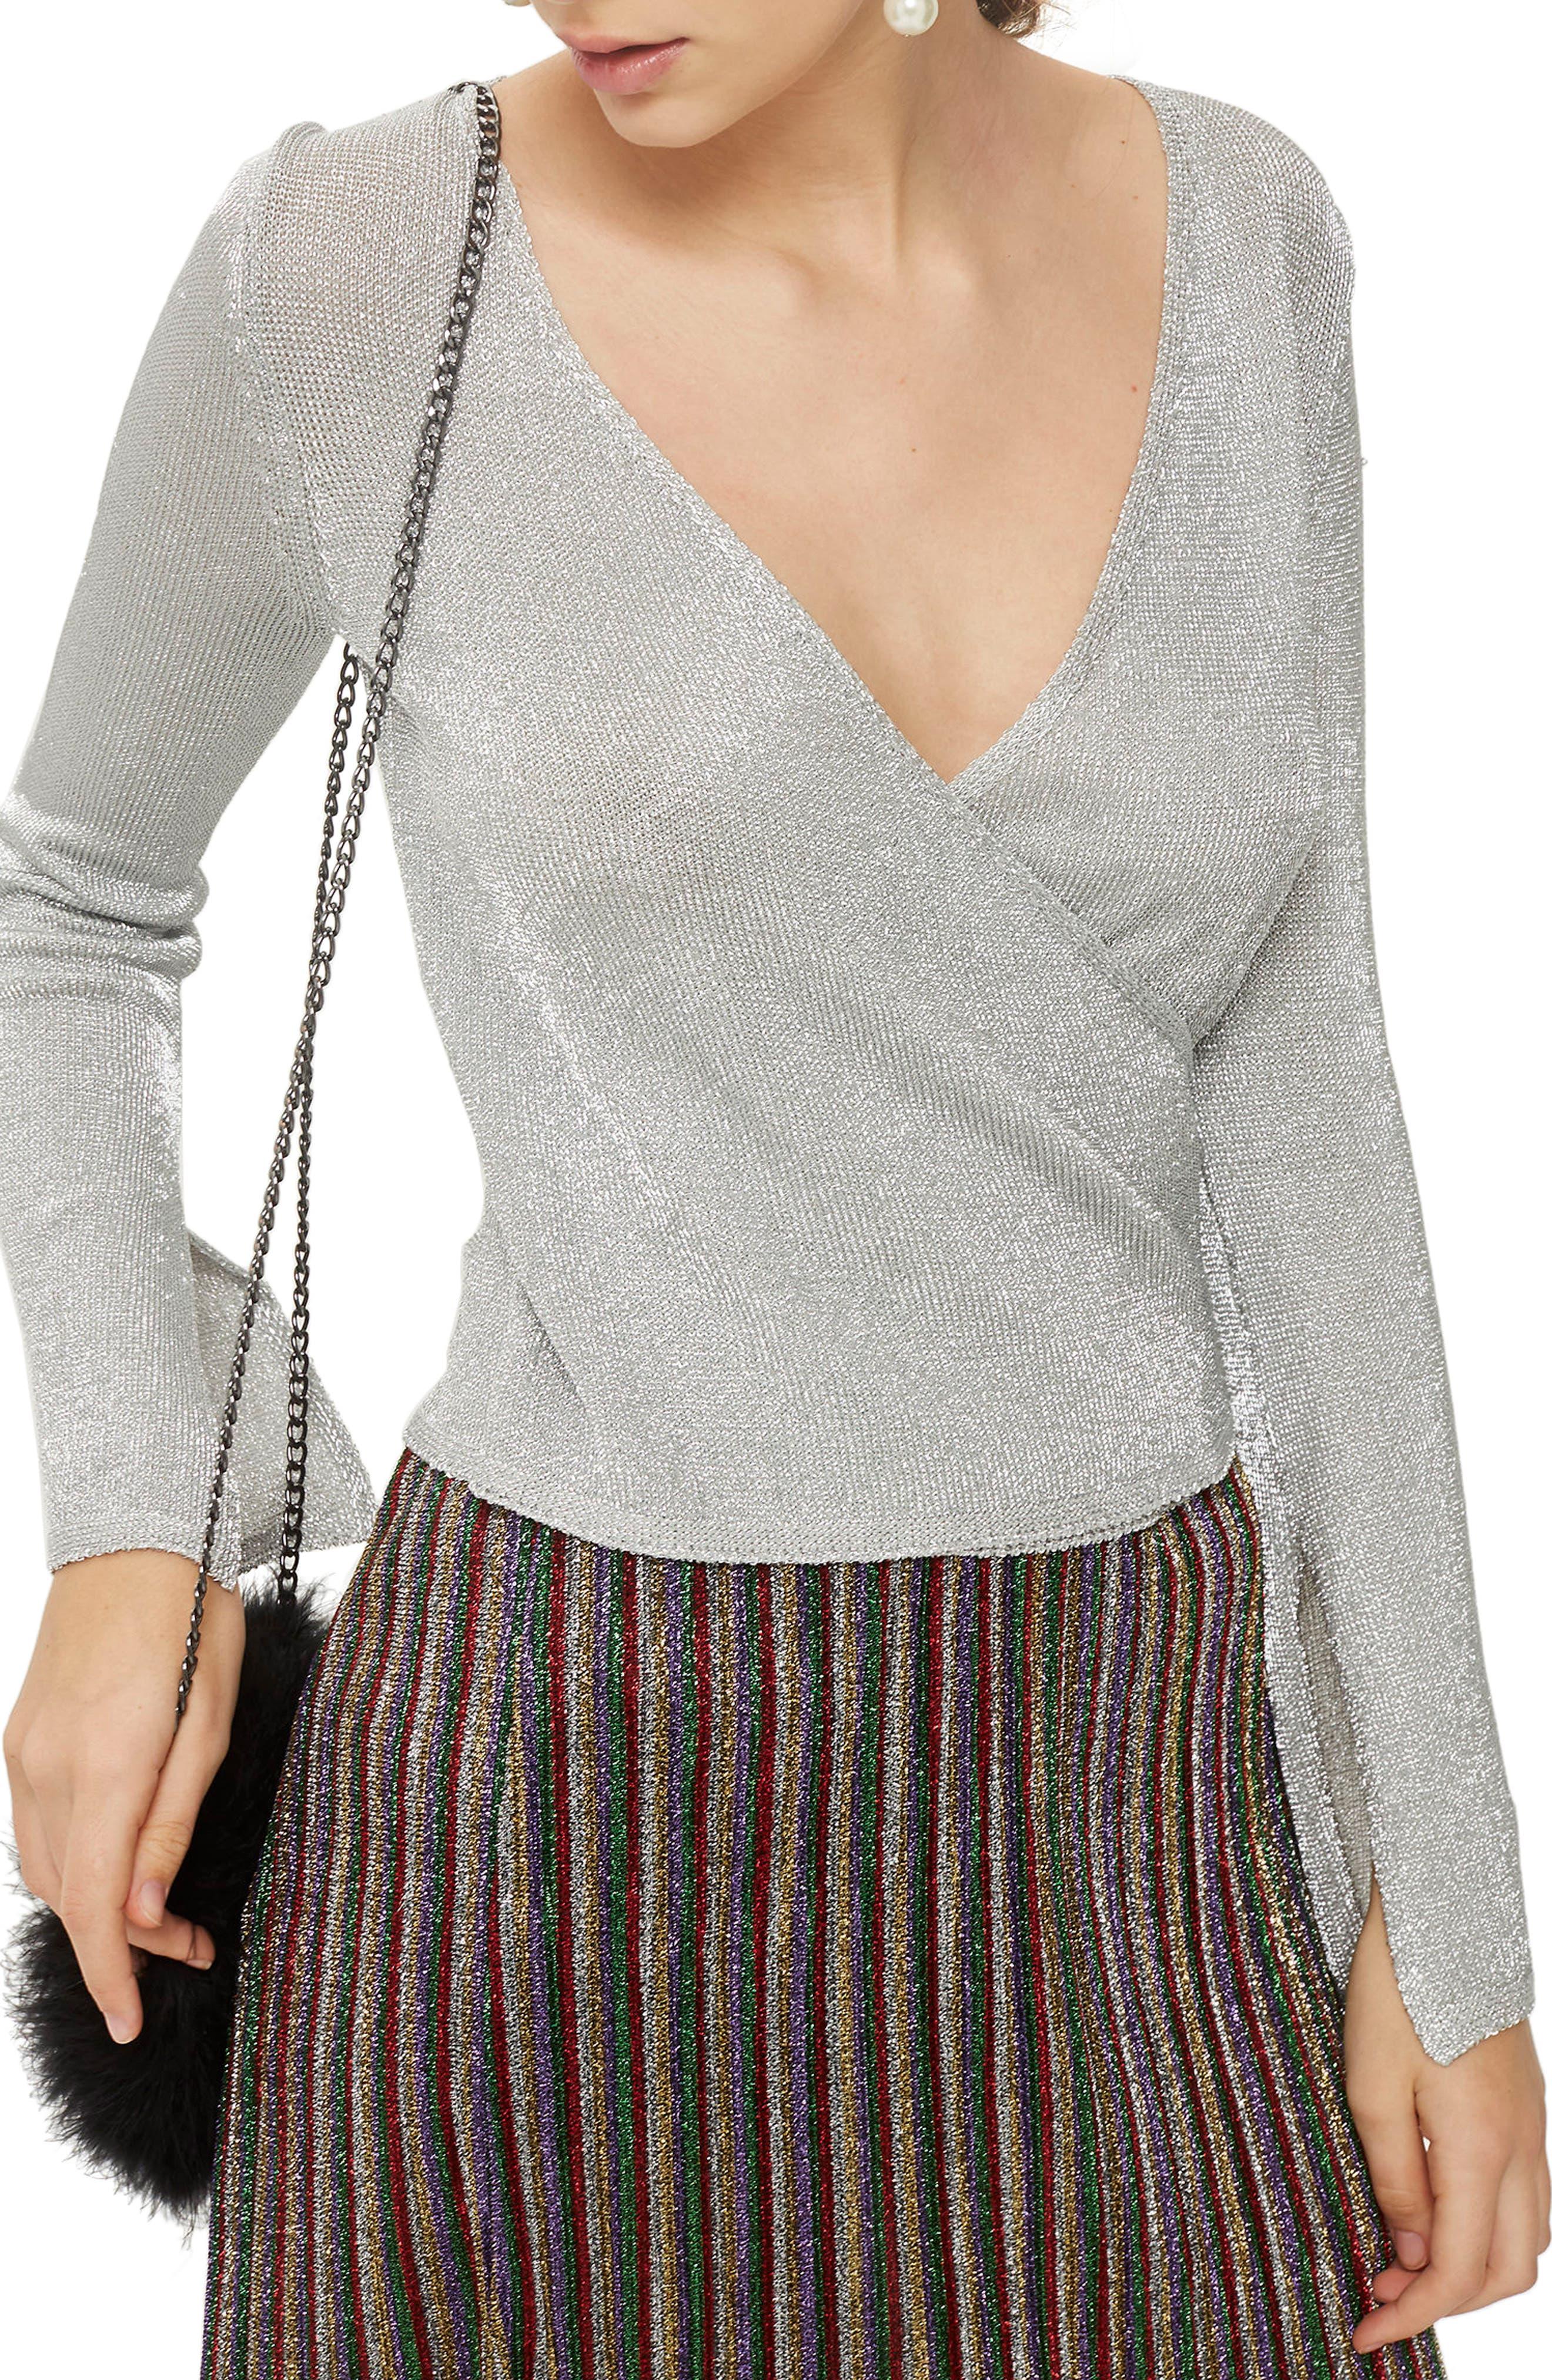 Topshop Metal Yarn Wrap Knit Top